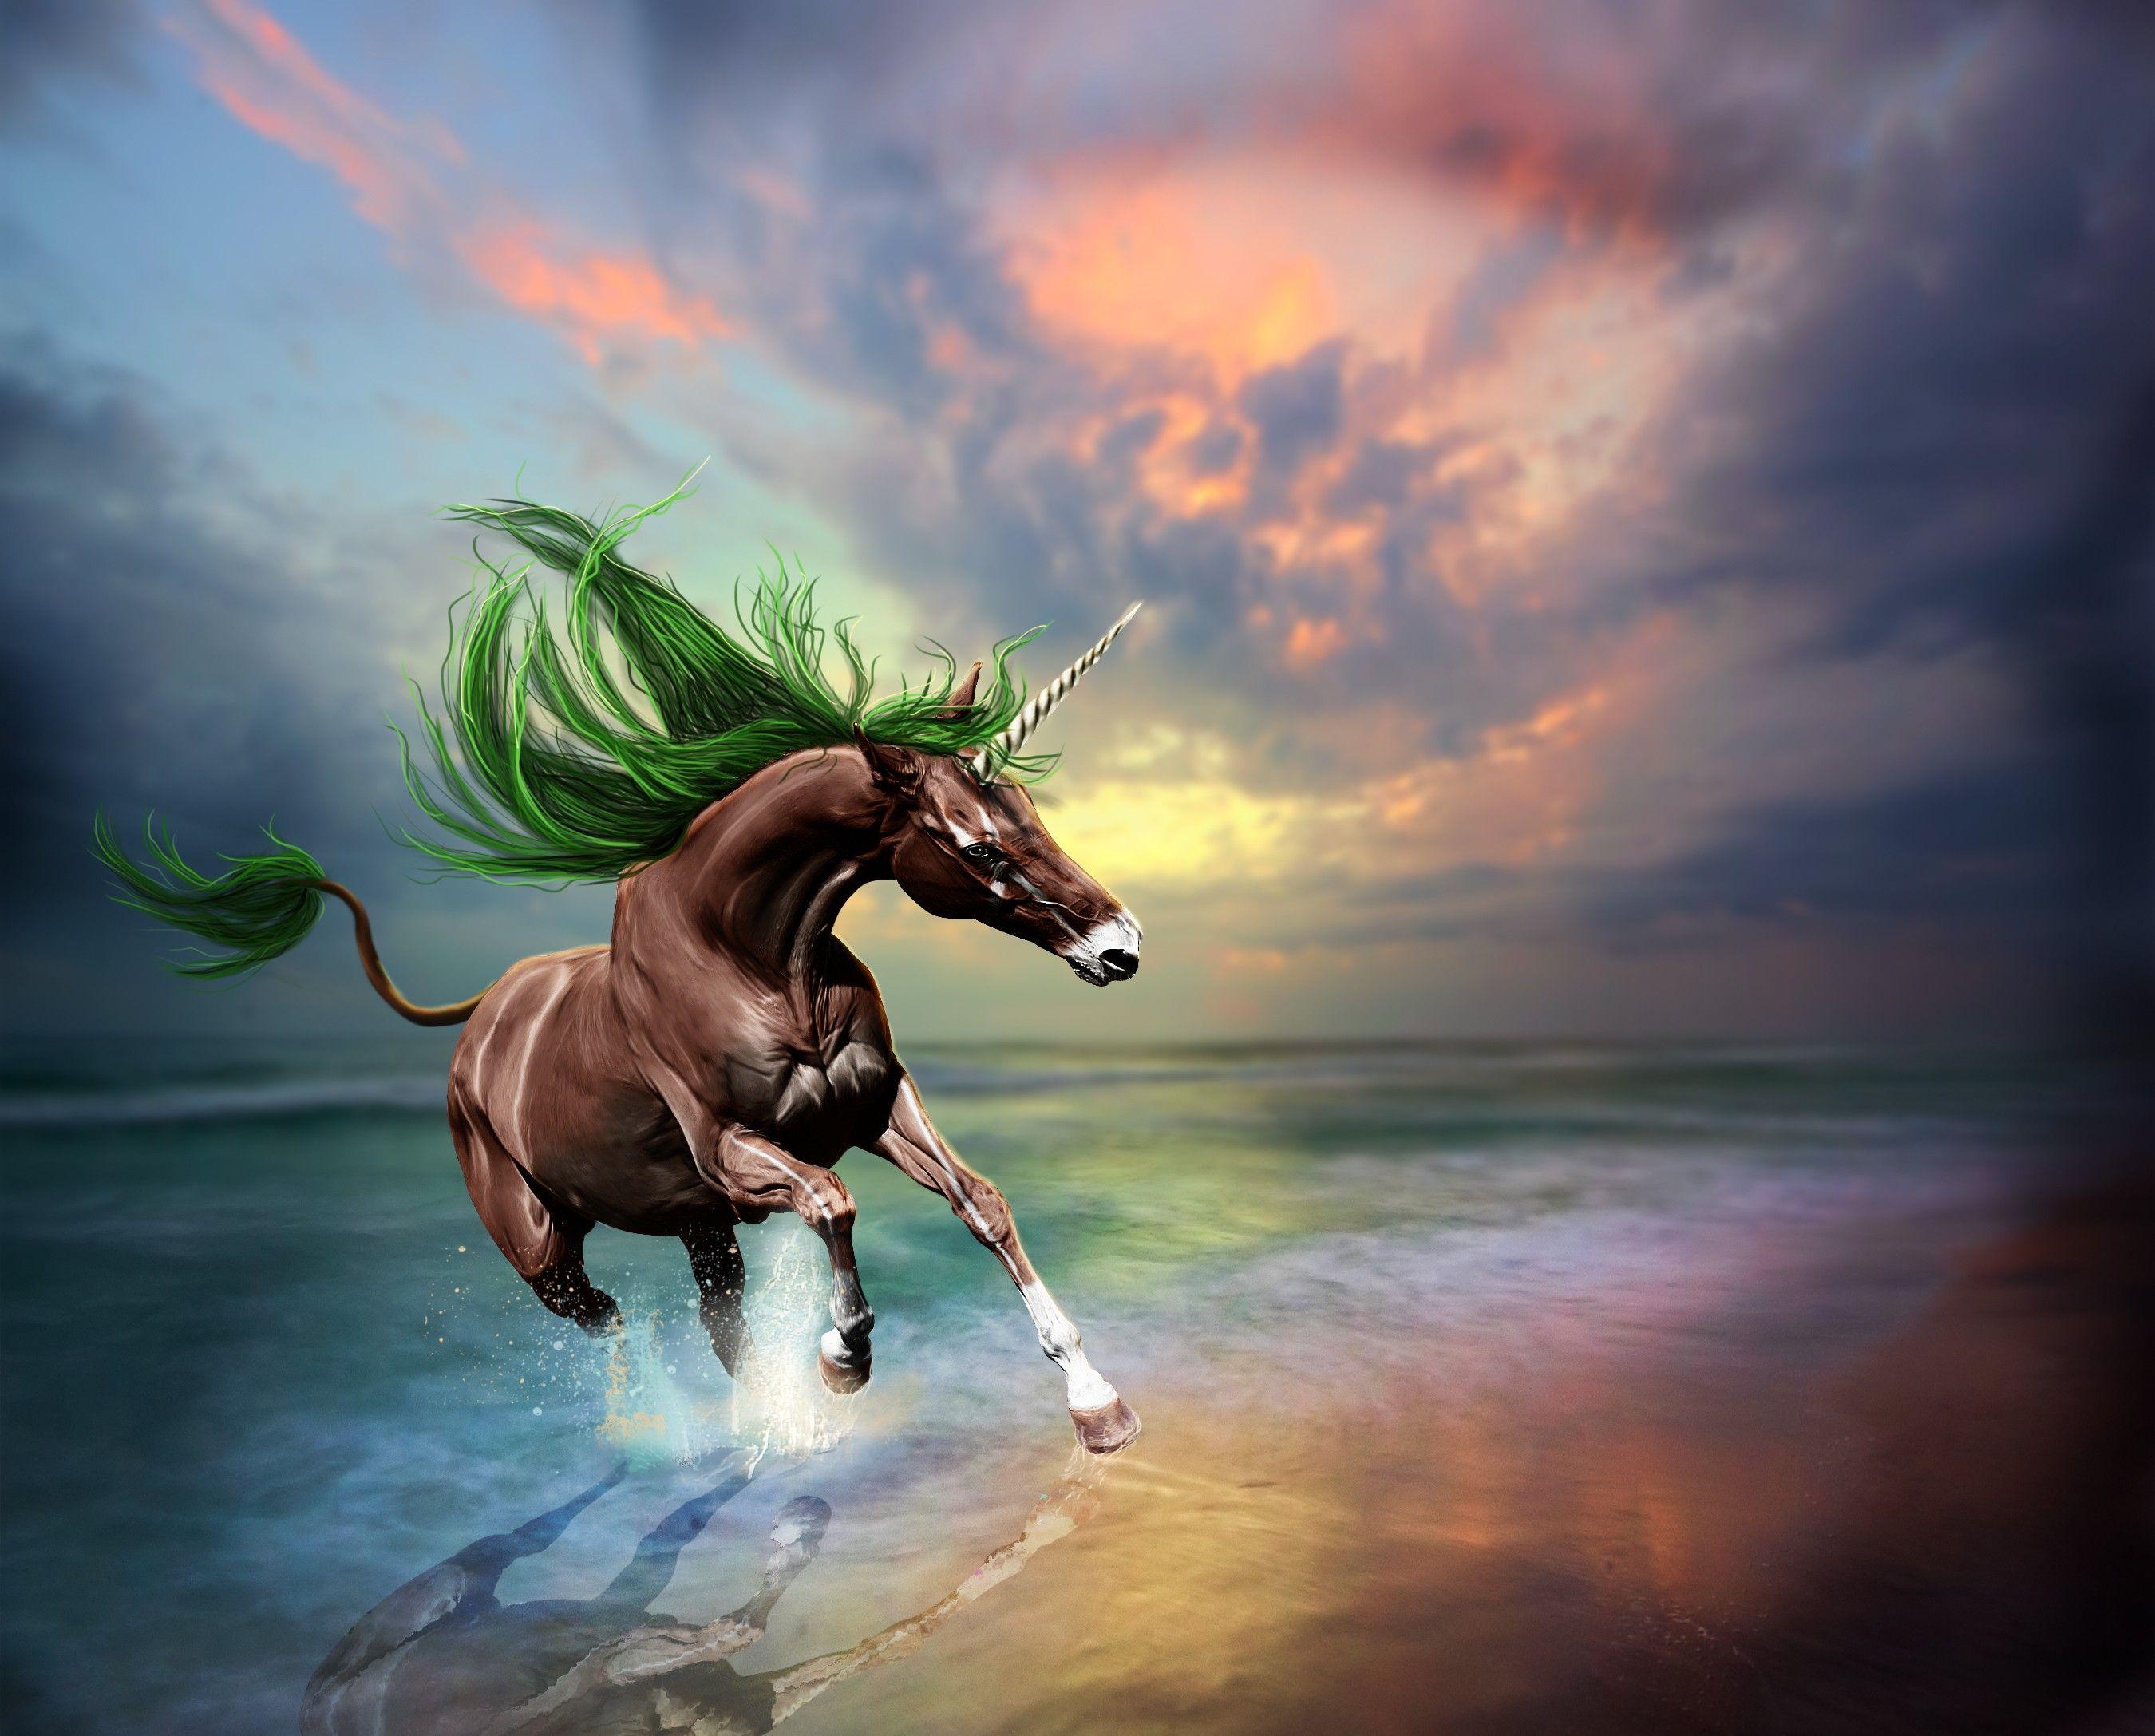 Best Wallpaper Horse Unicorn - e9720291242f32d47c56dff448c95685  Pic_288495.jpg